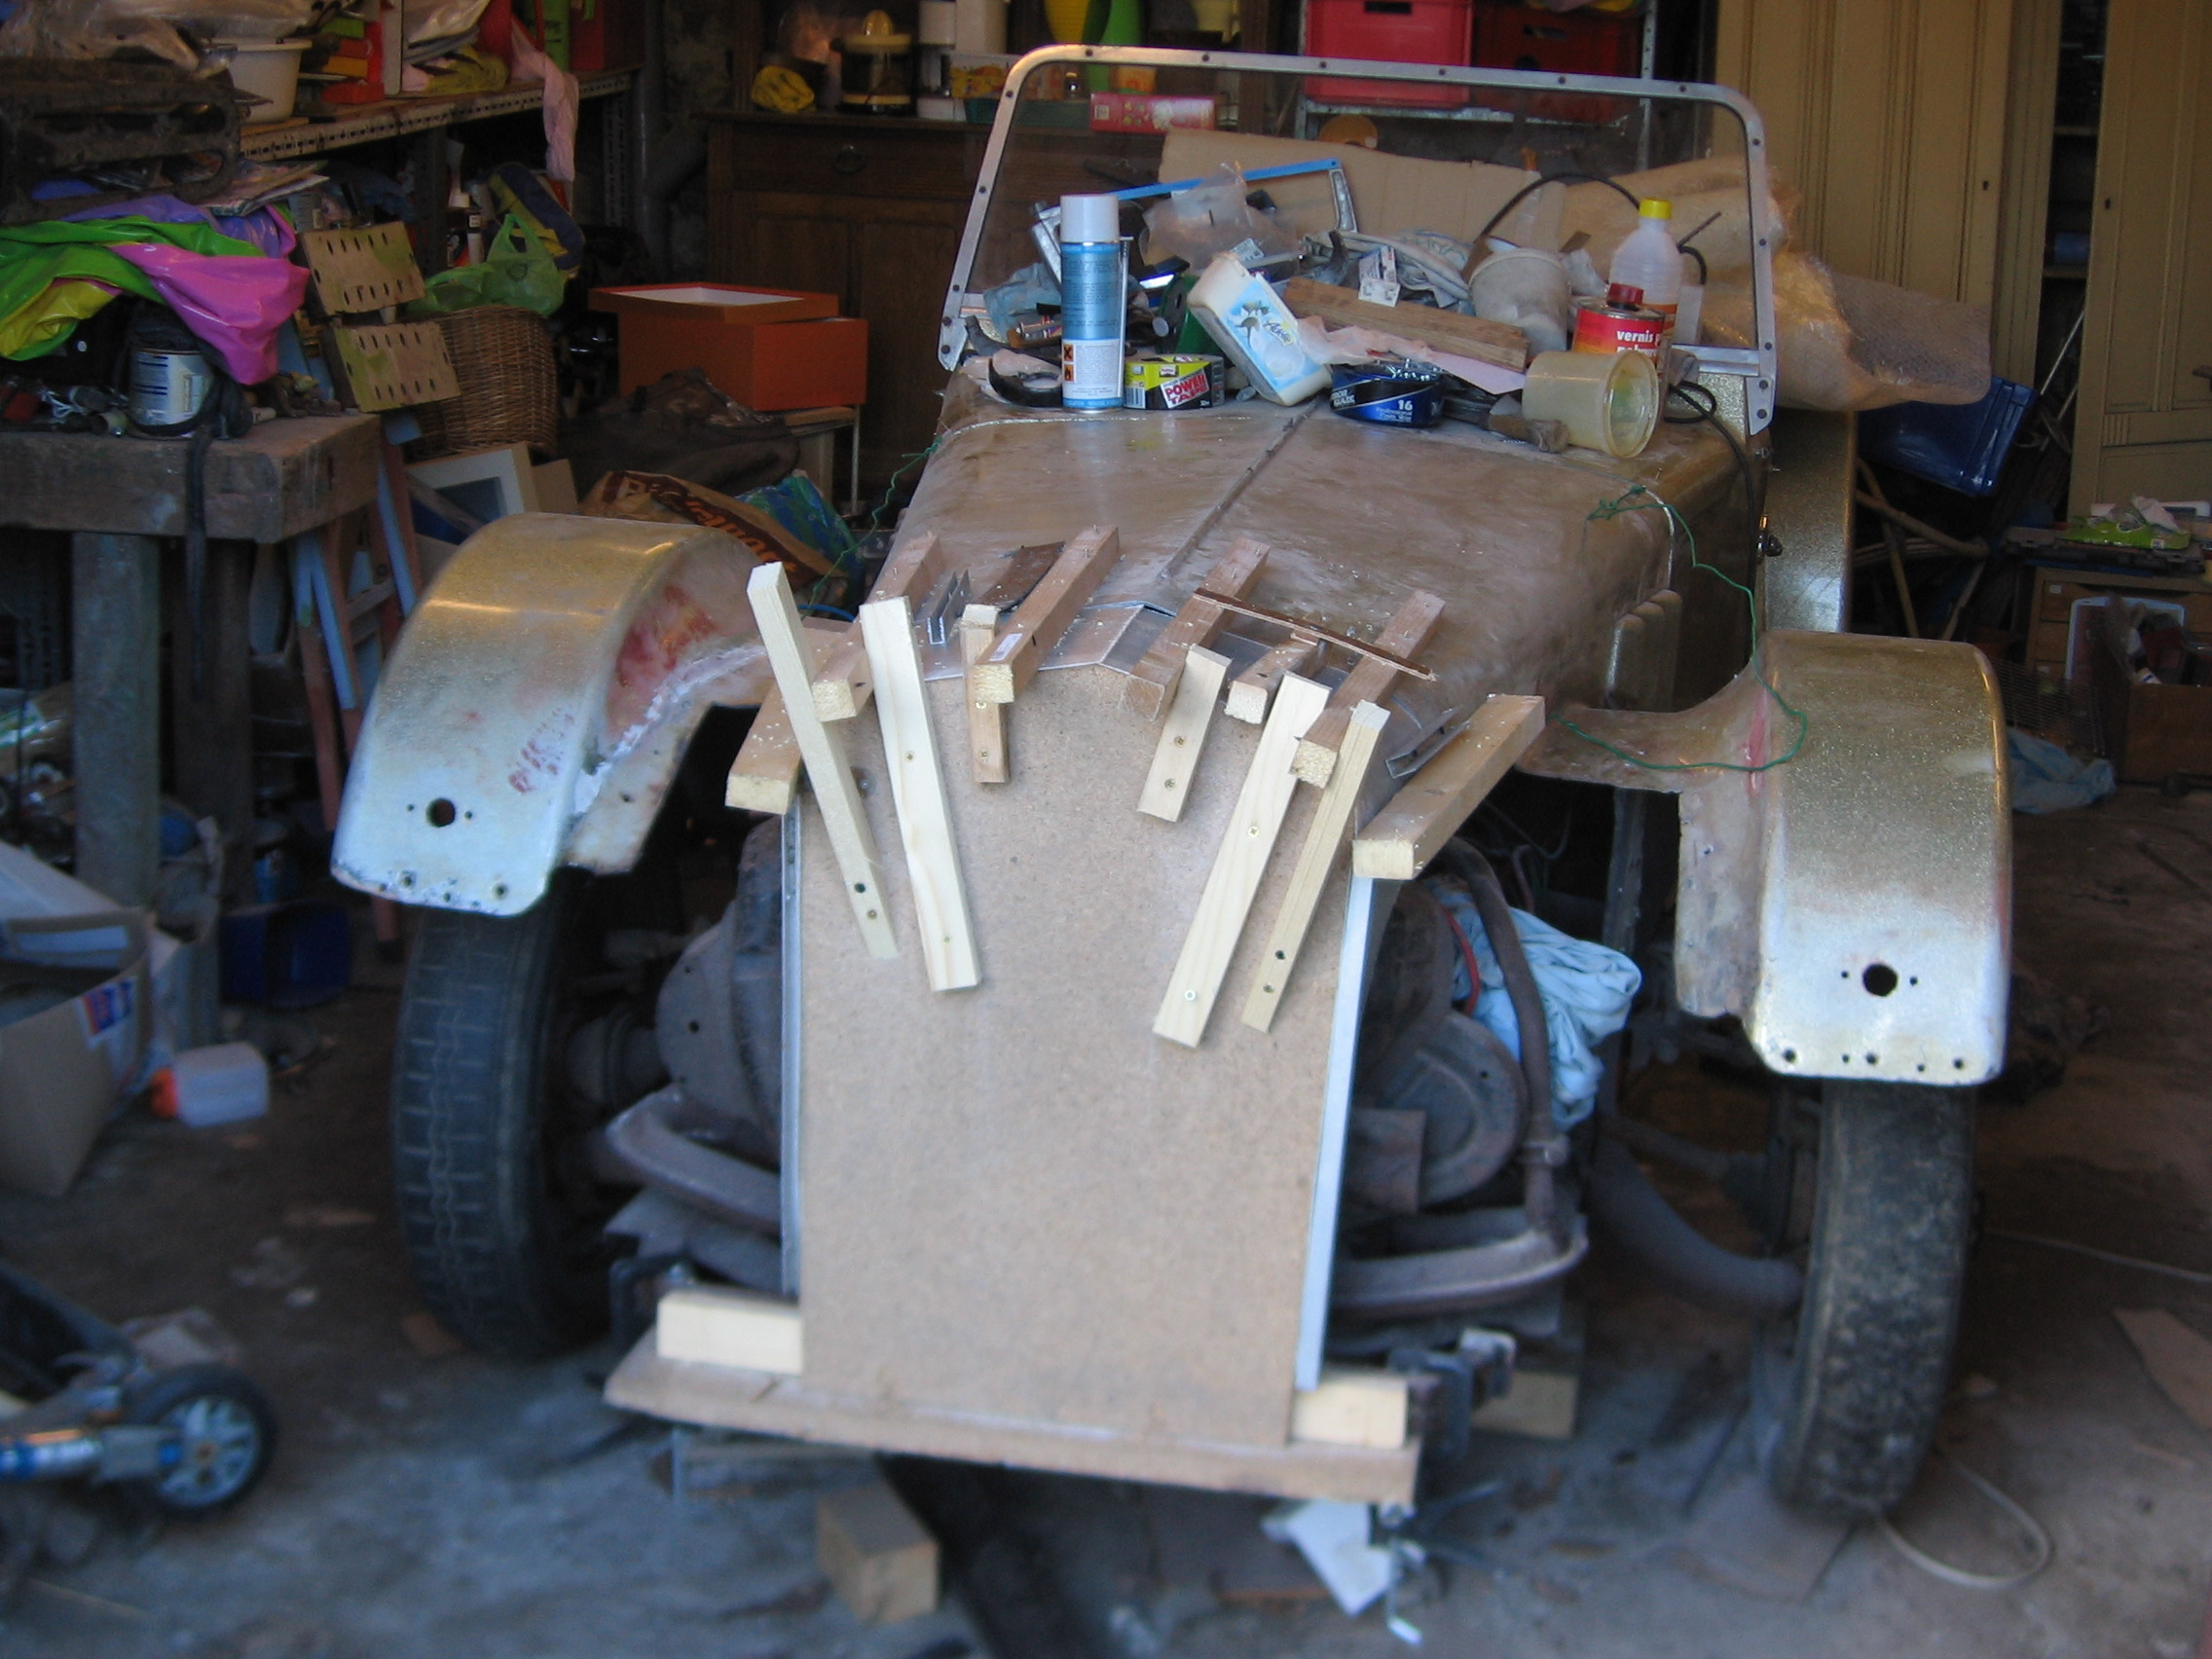 ar-roue-warock-002.jpg